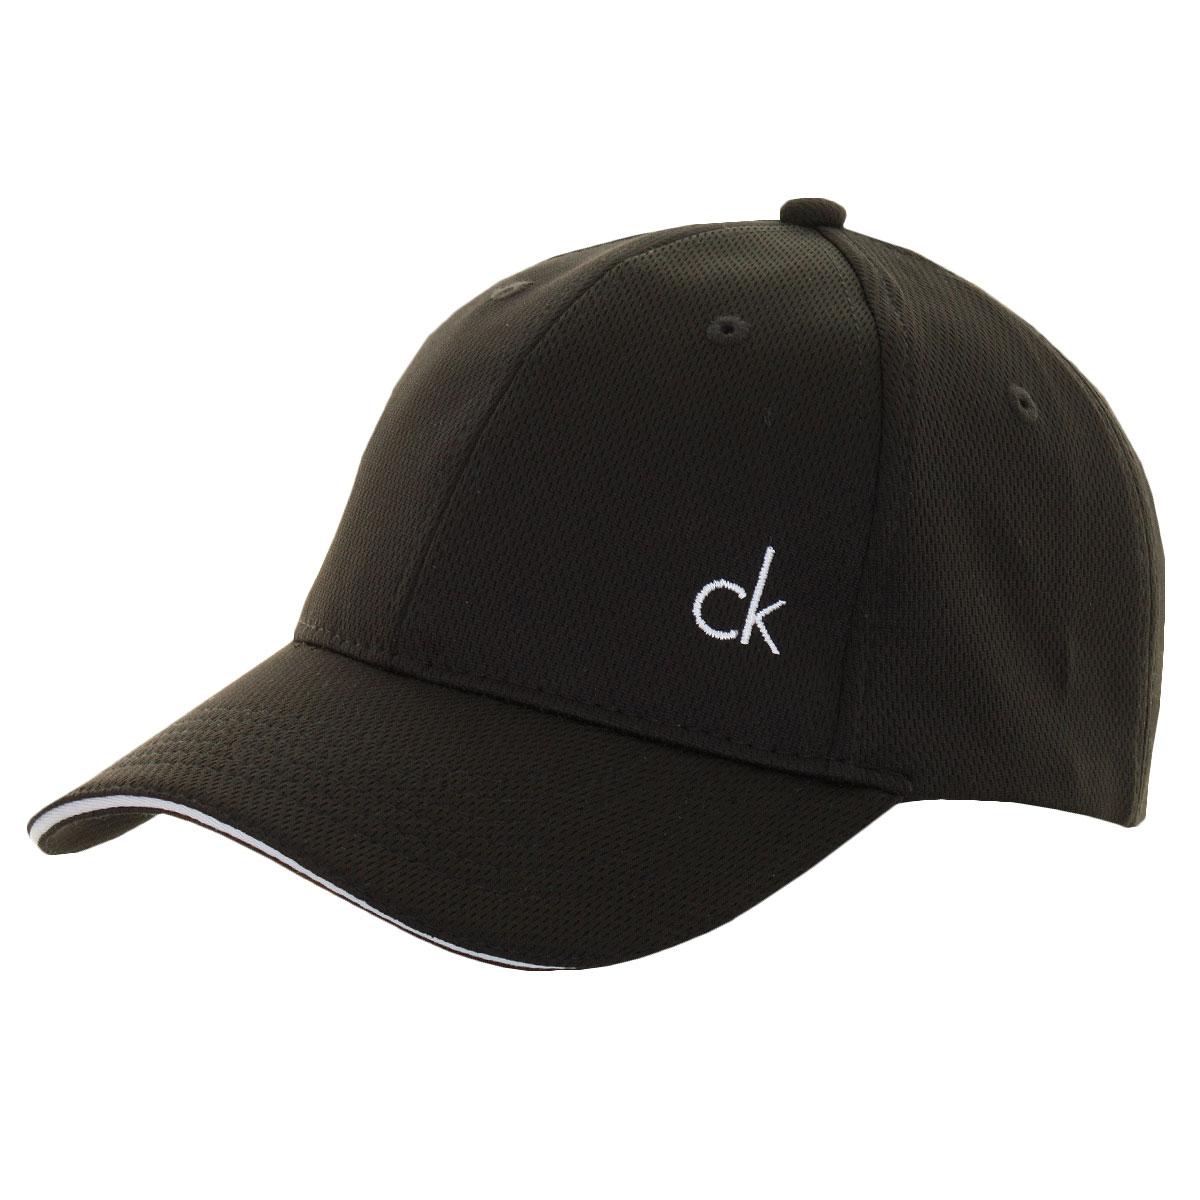 calvin klein golf mens ck airtex adjustable mesh baseball cap 40 off rrp ebay. Black Bedroom Furniture Sets. Home Design Ideas